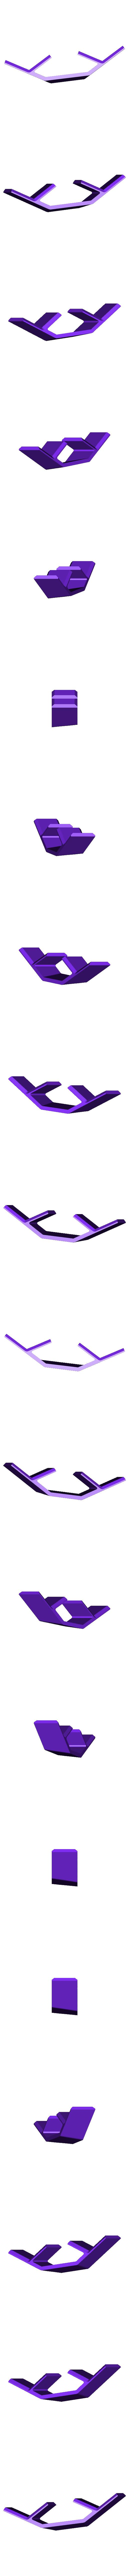 Holder -V.stl Download STL file Modular Spice Rack • 3D printable template, TimBauer-TB3Dprint